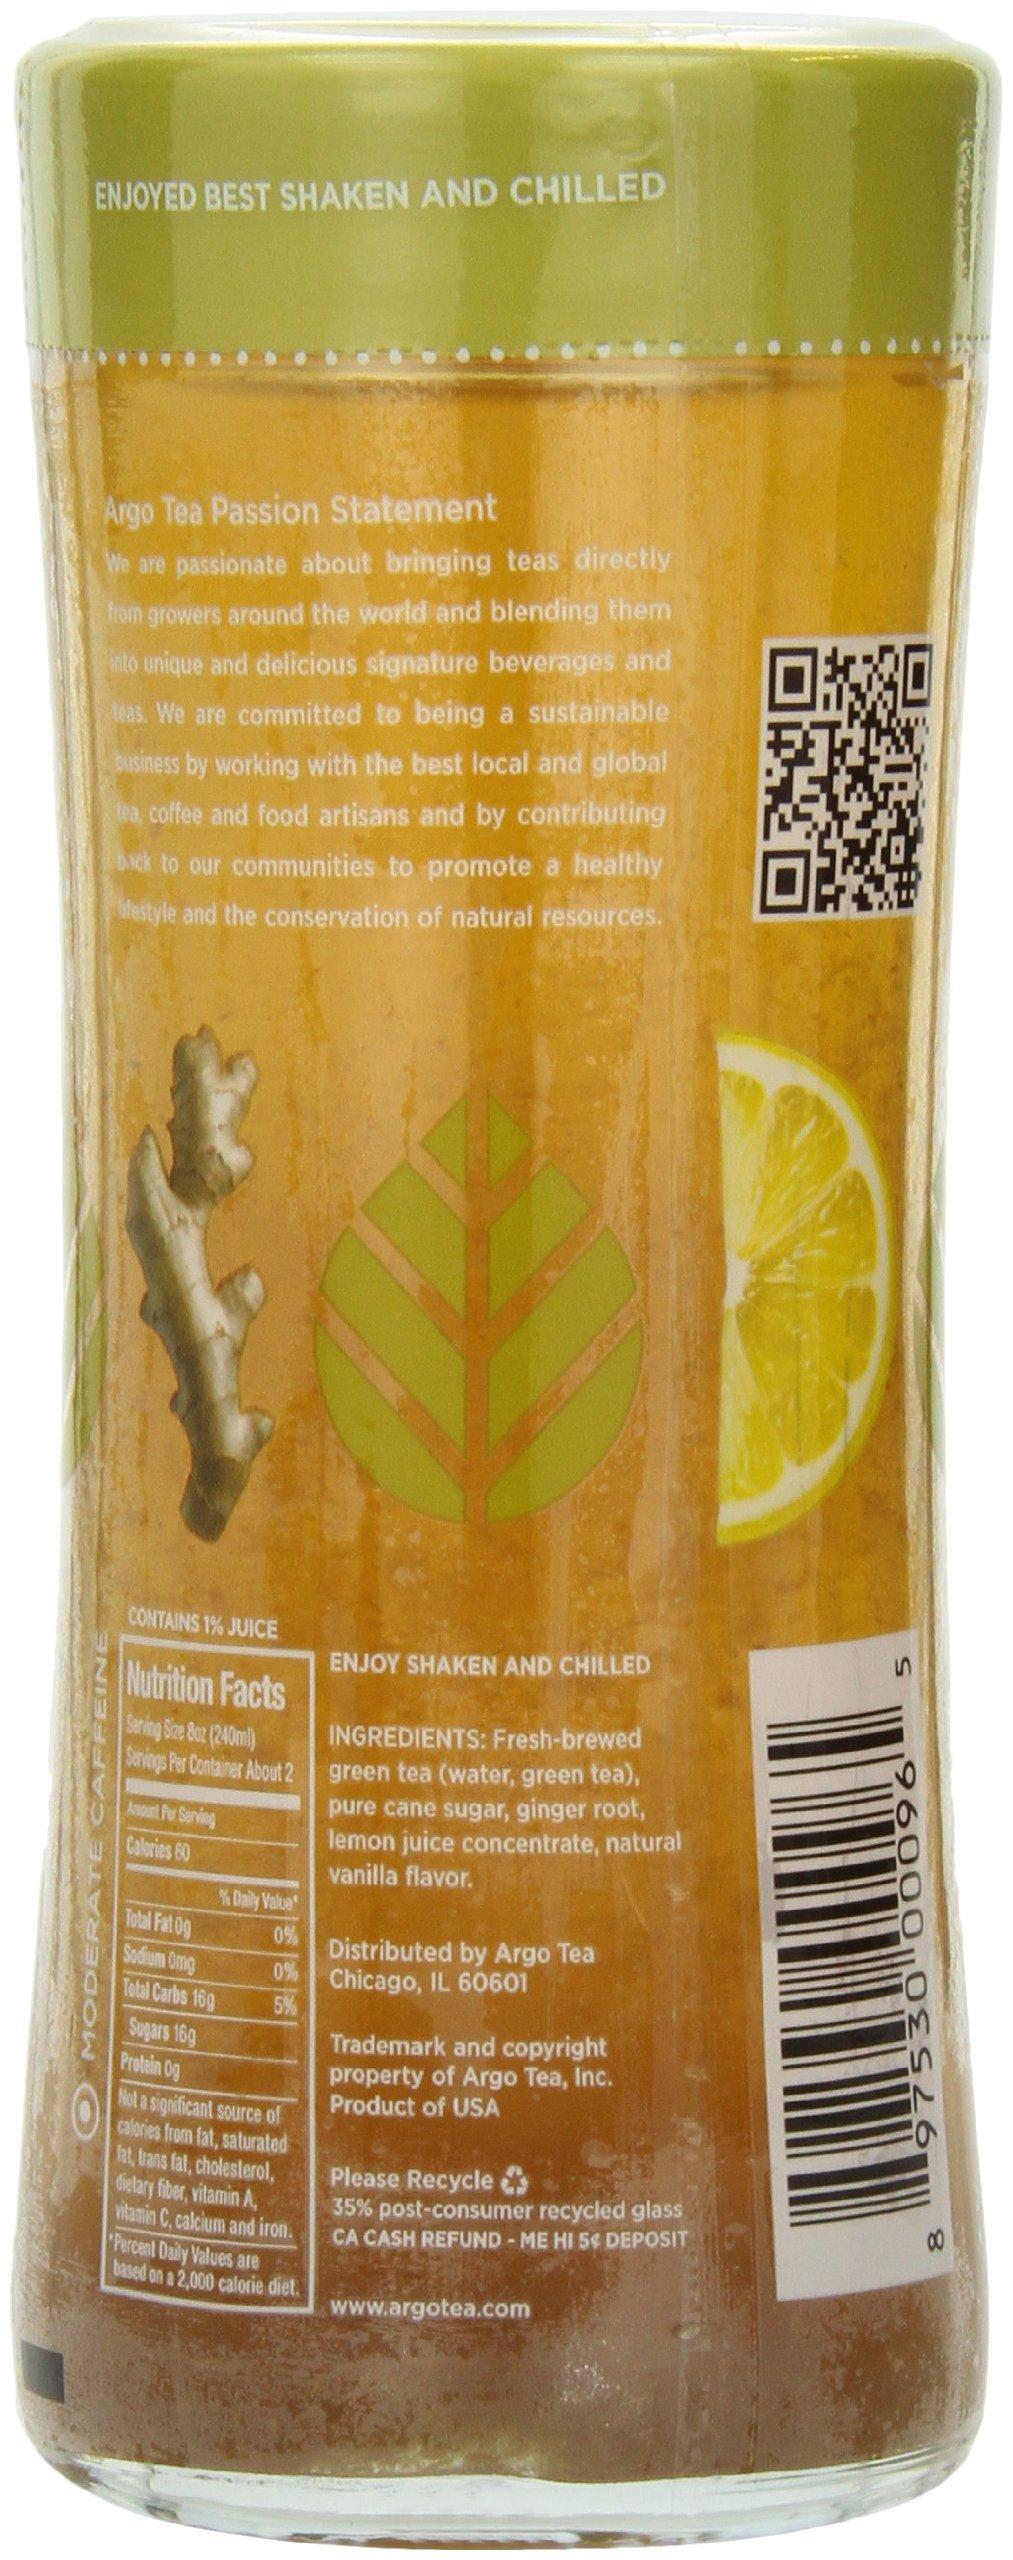 Argo Tea Iced Tea, Green Tea Ginger Twist, 13.5 Ounce (Pack of 12) by Argo Tea (Image #4)